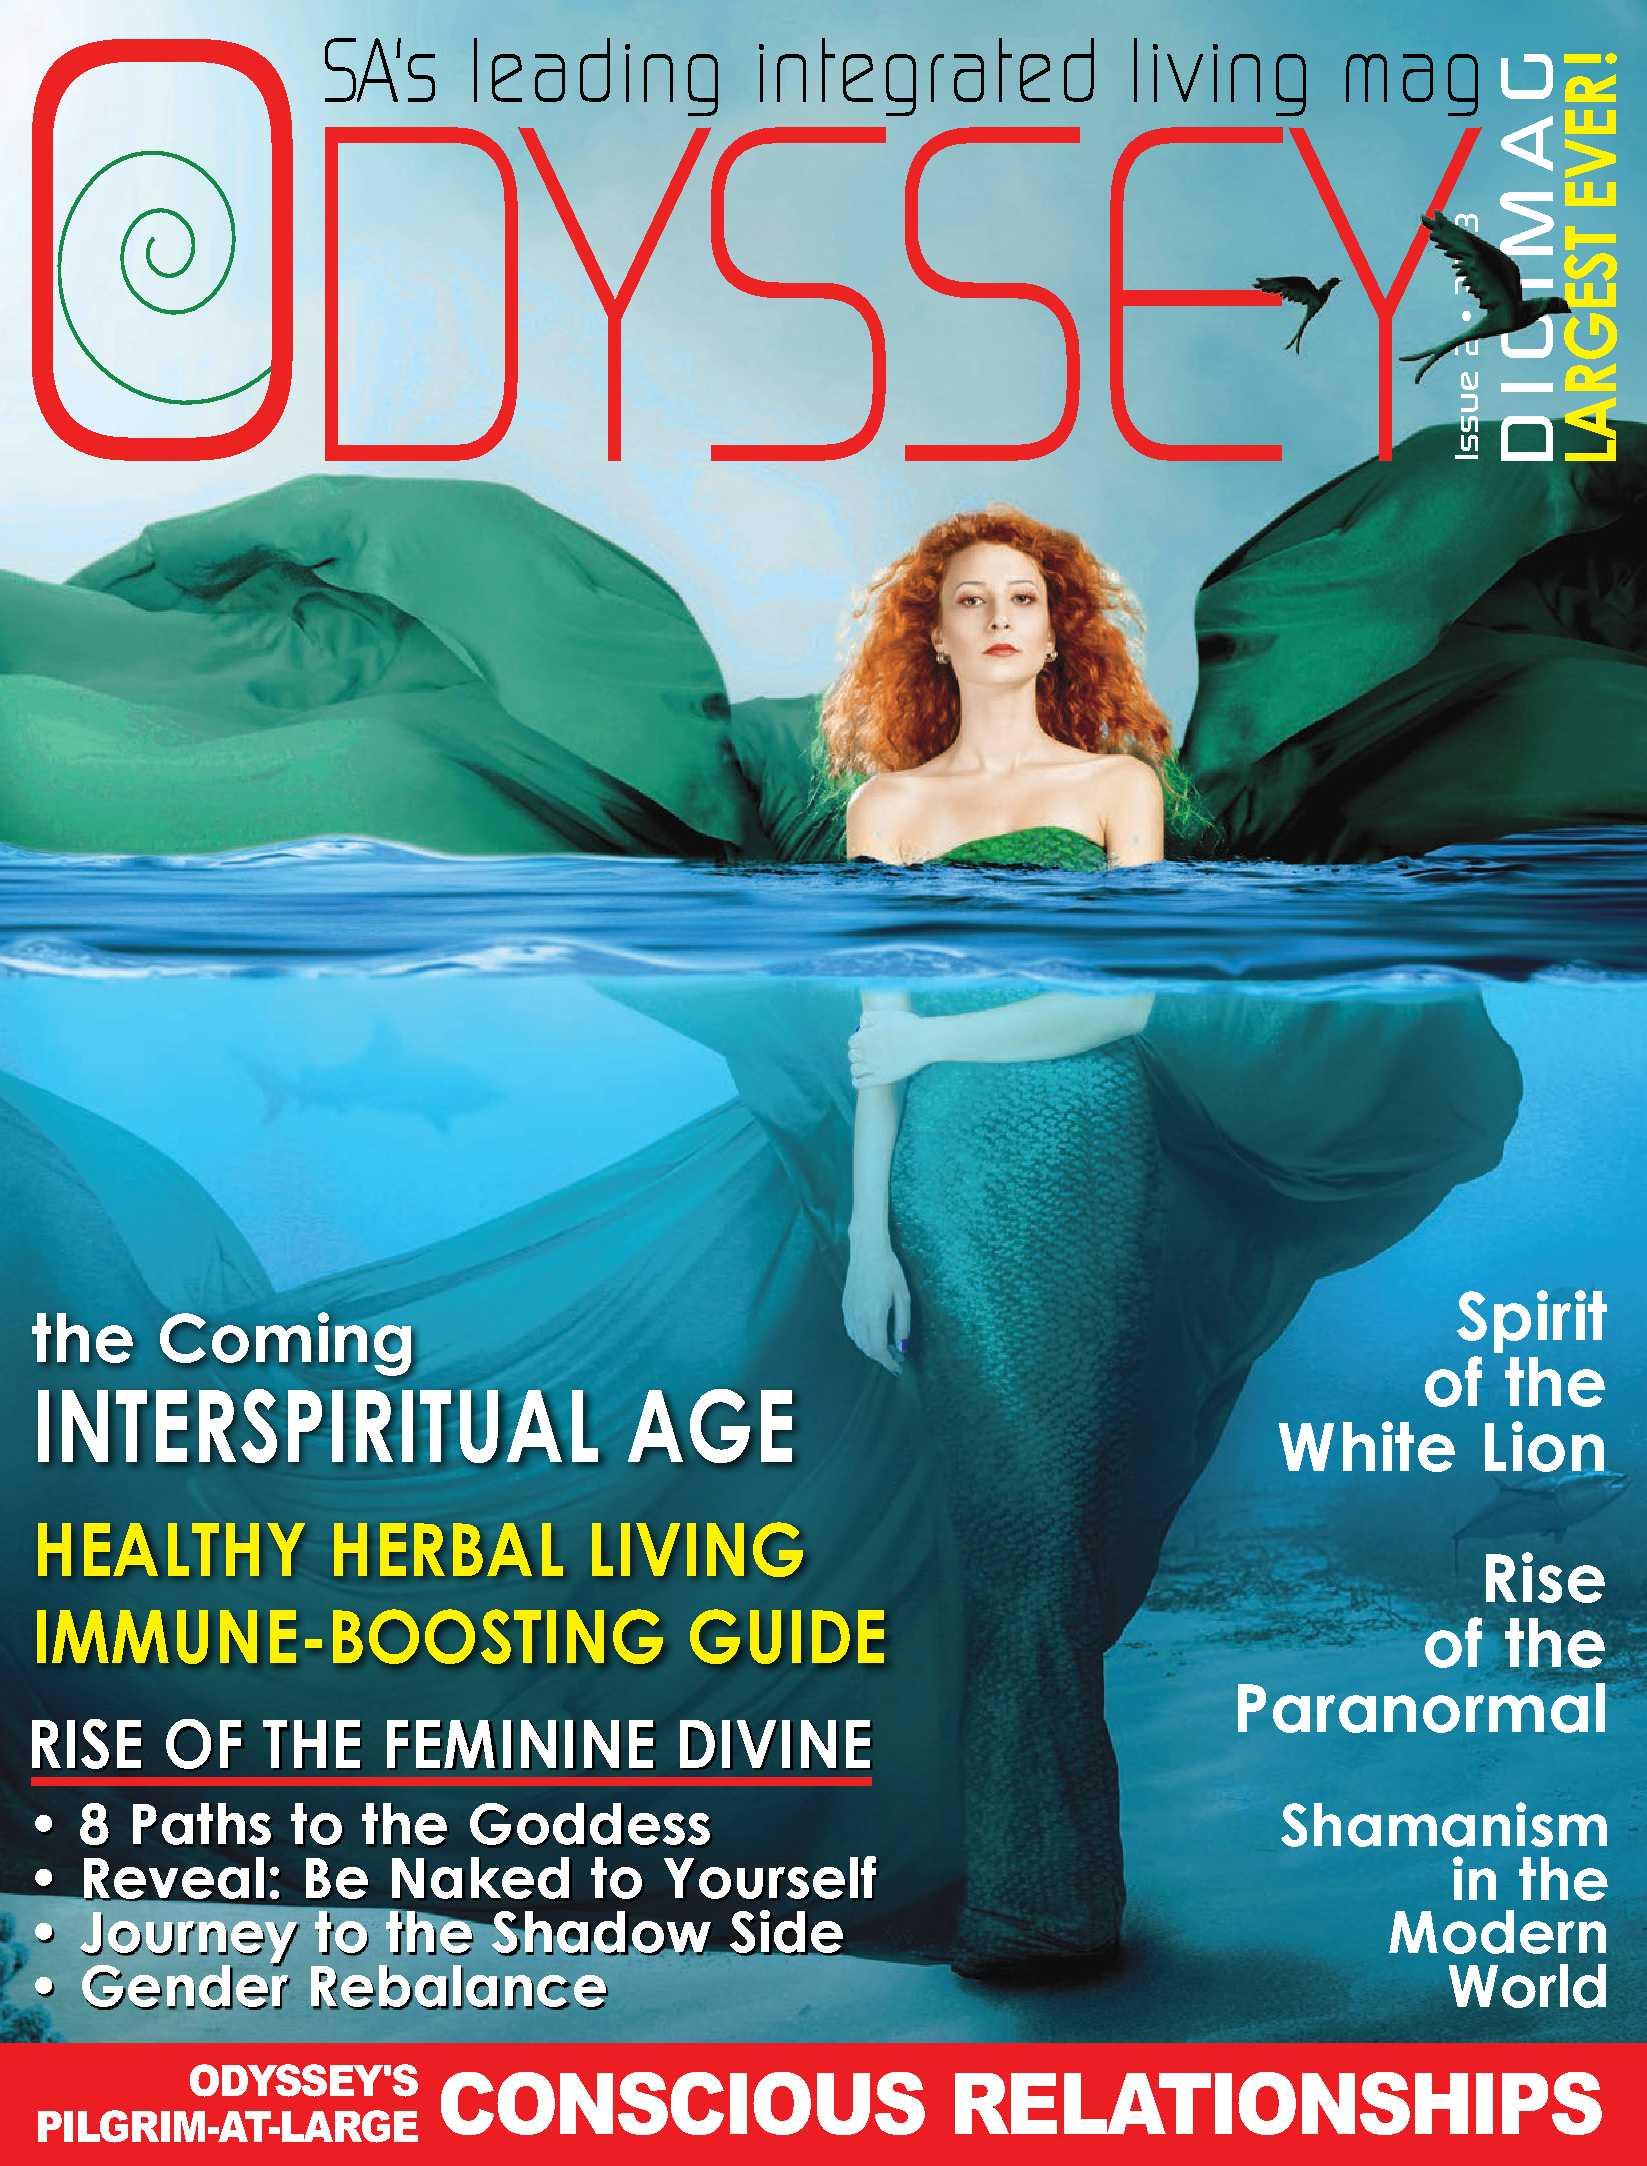 Prema article in Odyssey 0213_1.jpg